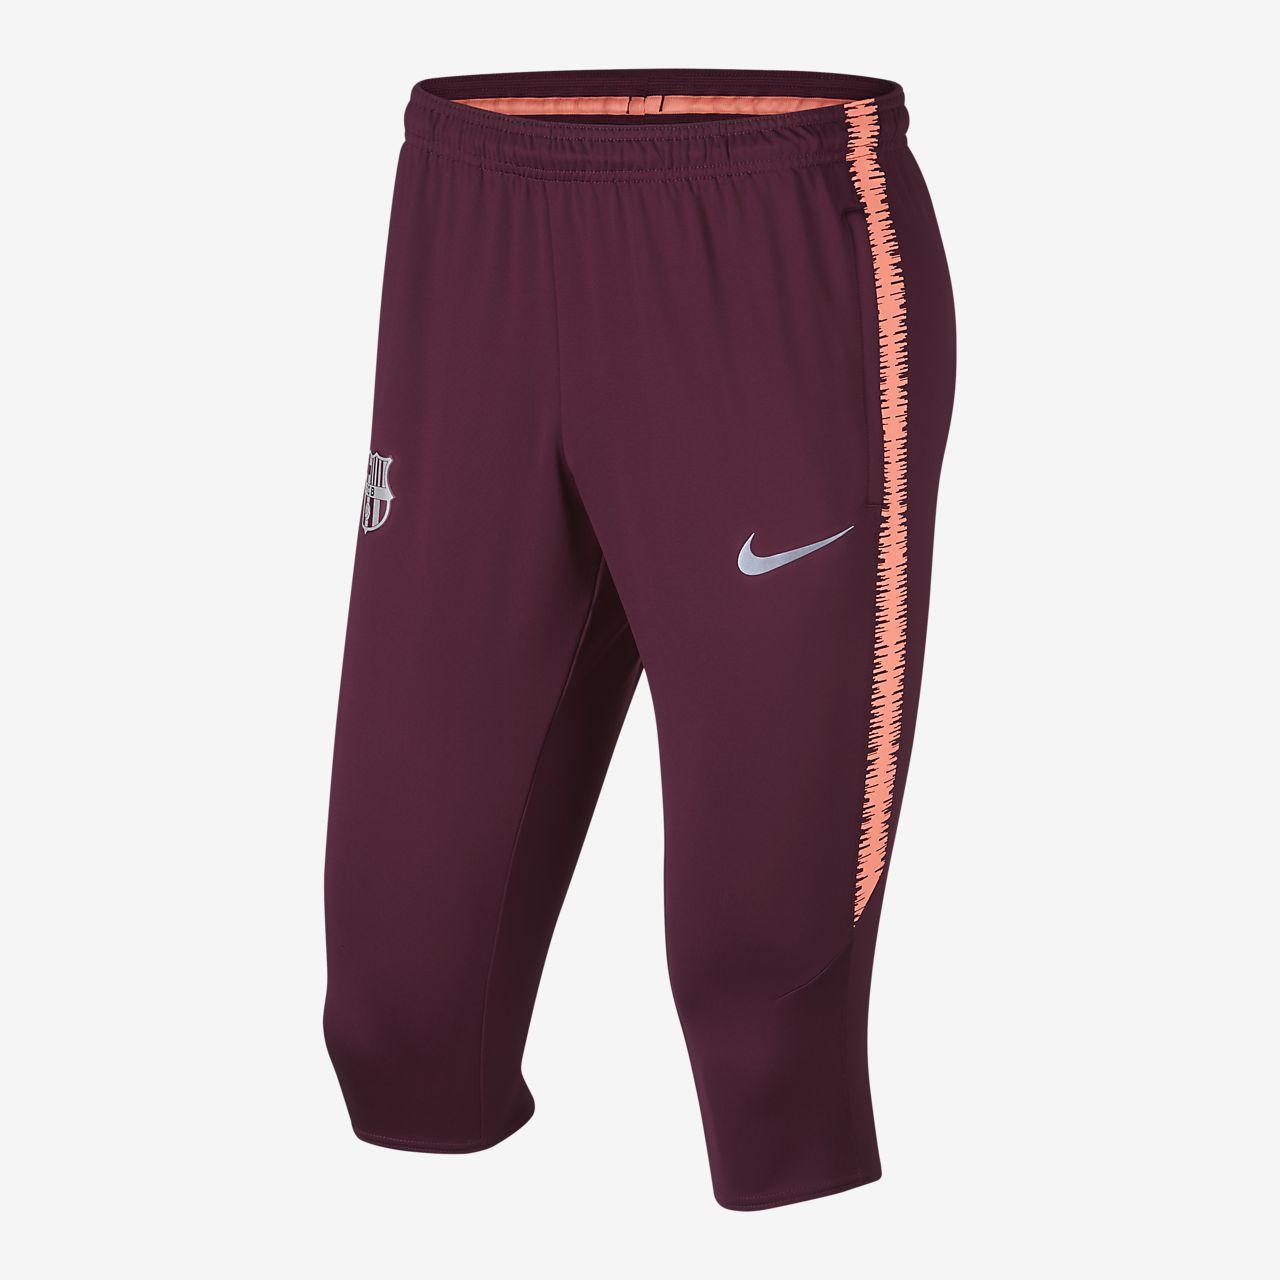 beb4fe8afdcf7 Pantalon de football 3 4 FC Barcelona Dri-FIT Squad pour Homme. Nike ...